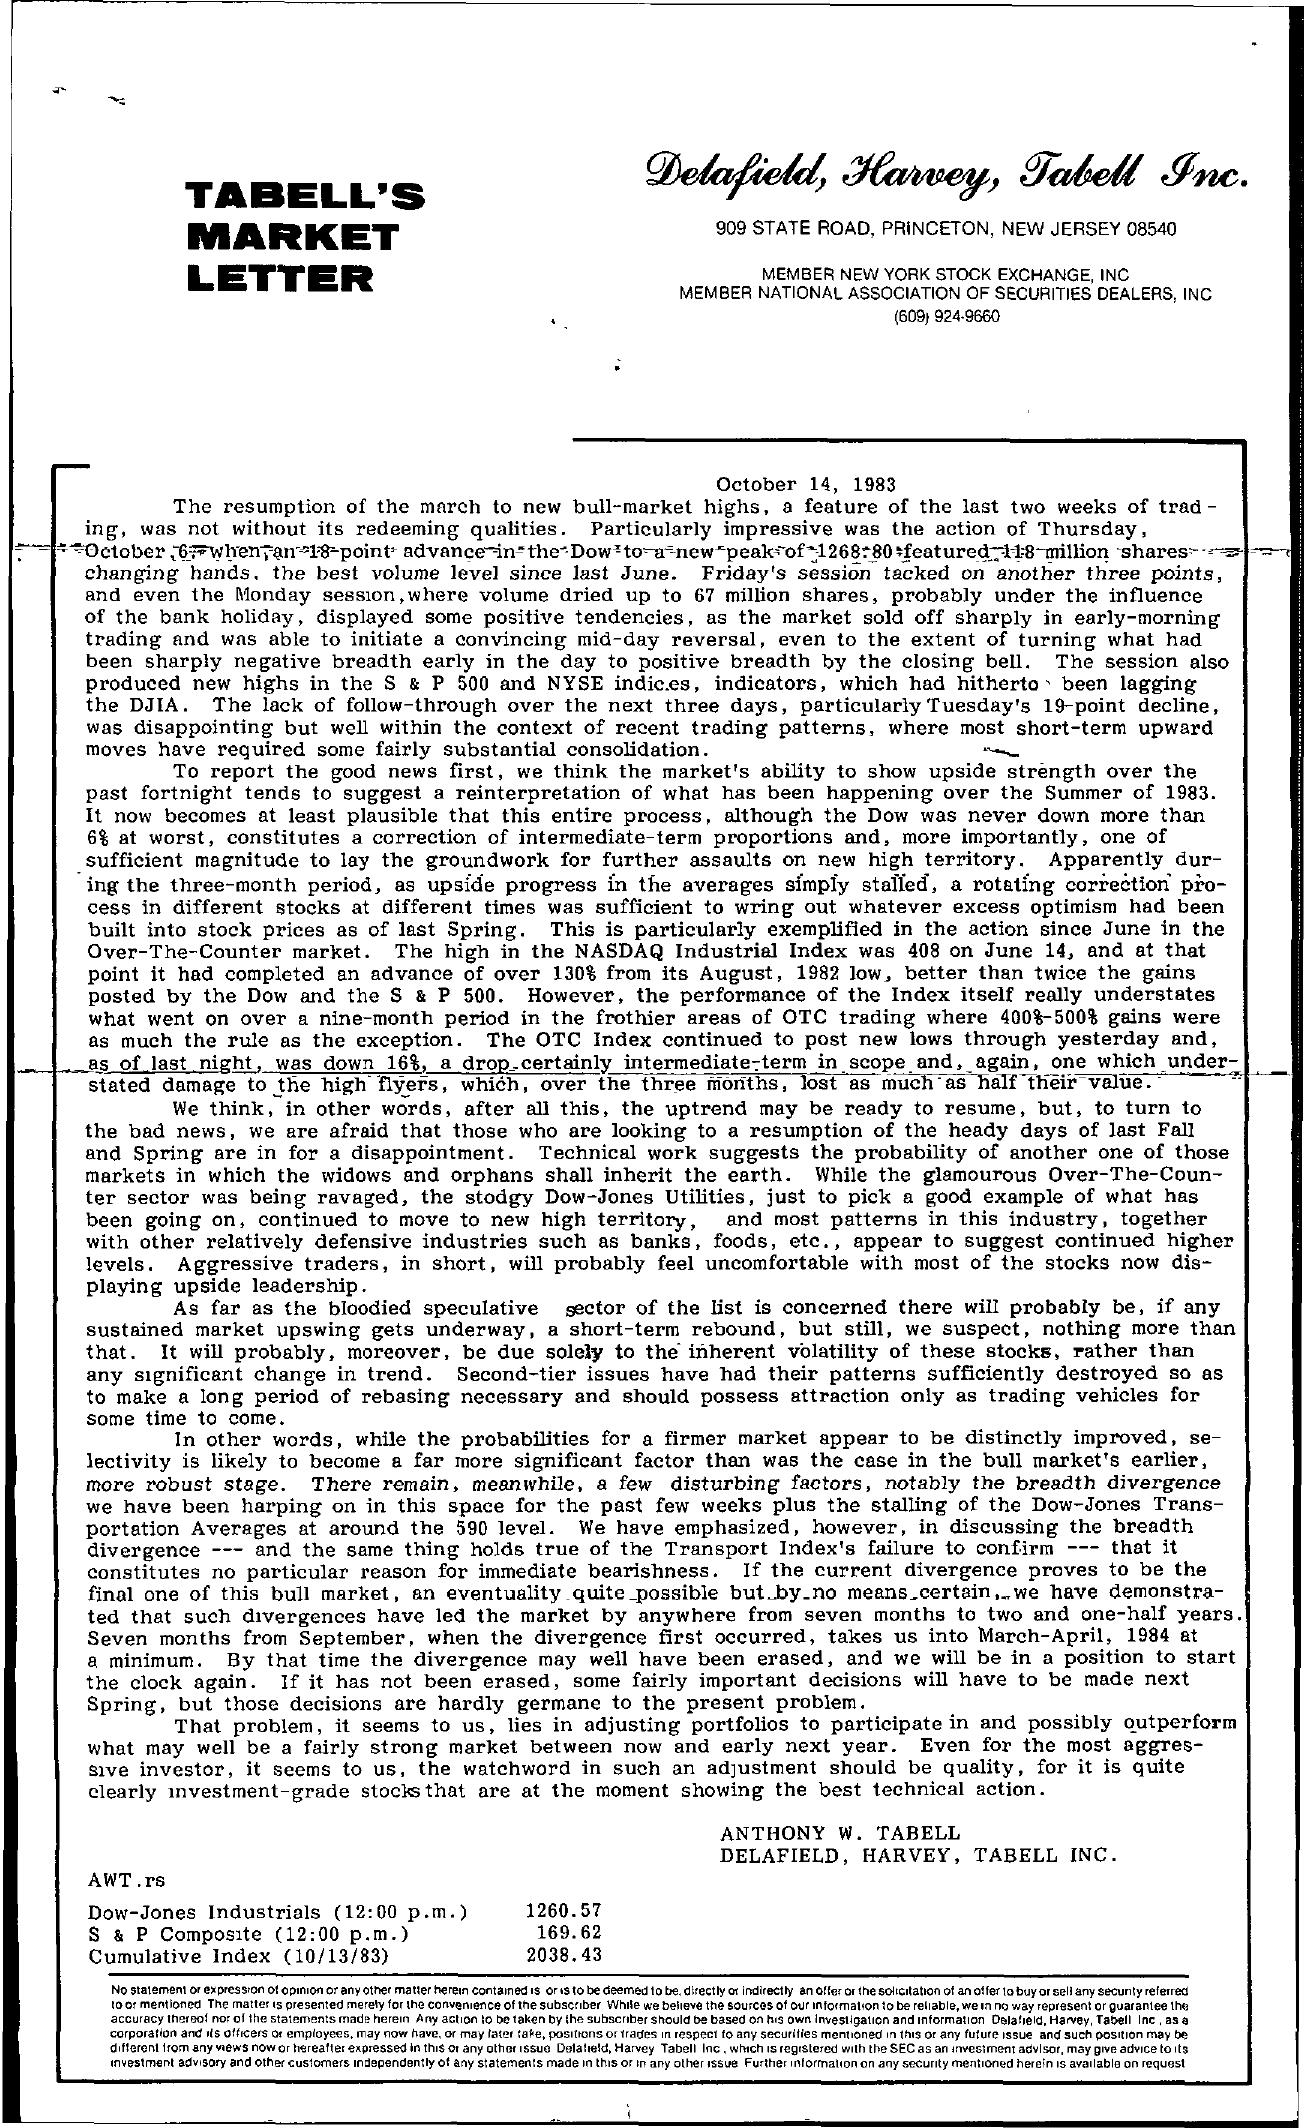 Tabell's Market Letter - October 14, 1983